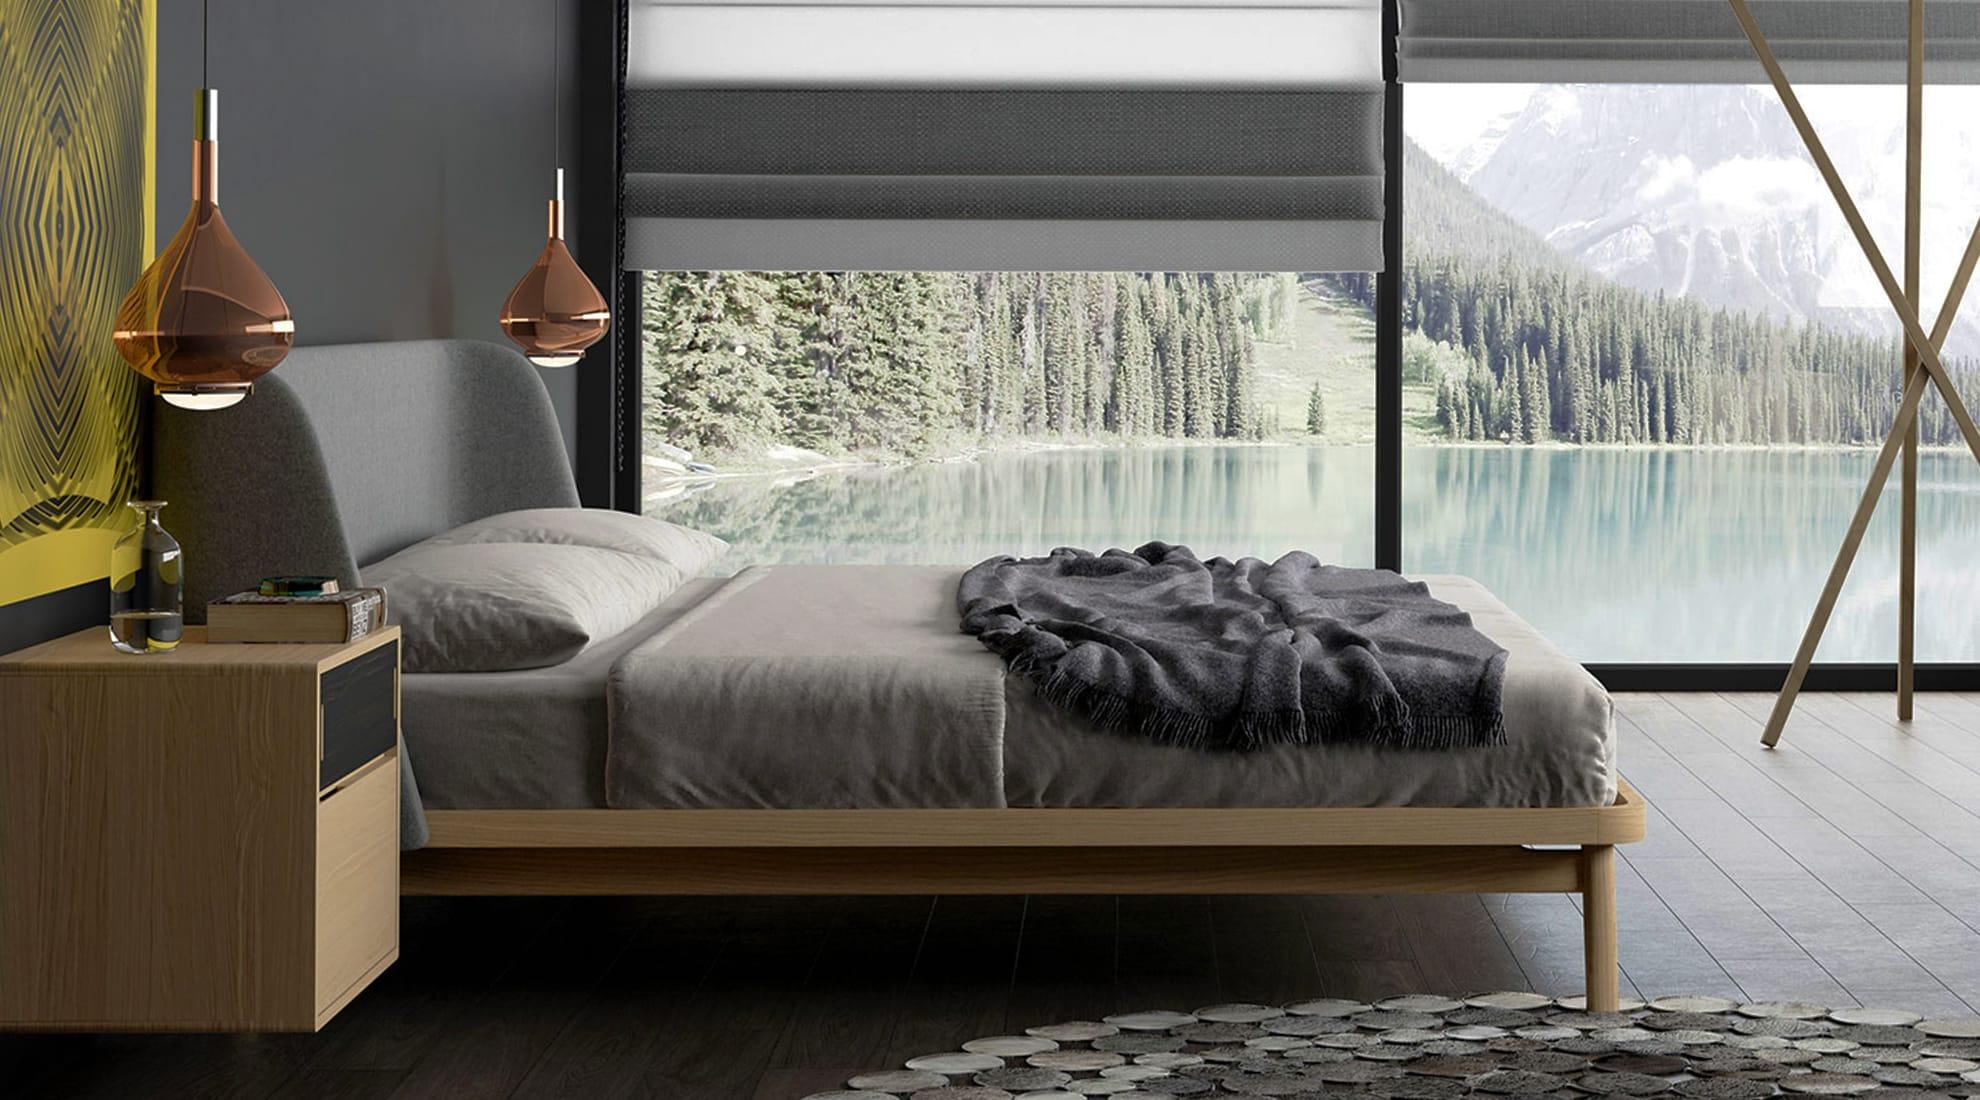 Haru Bed by Modloft and Sky Fall LED Pendant by Studio Italia Design